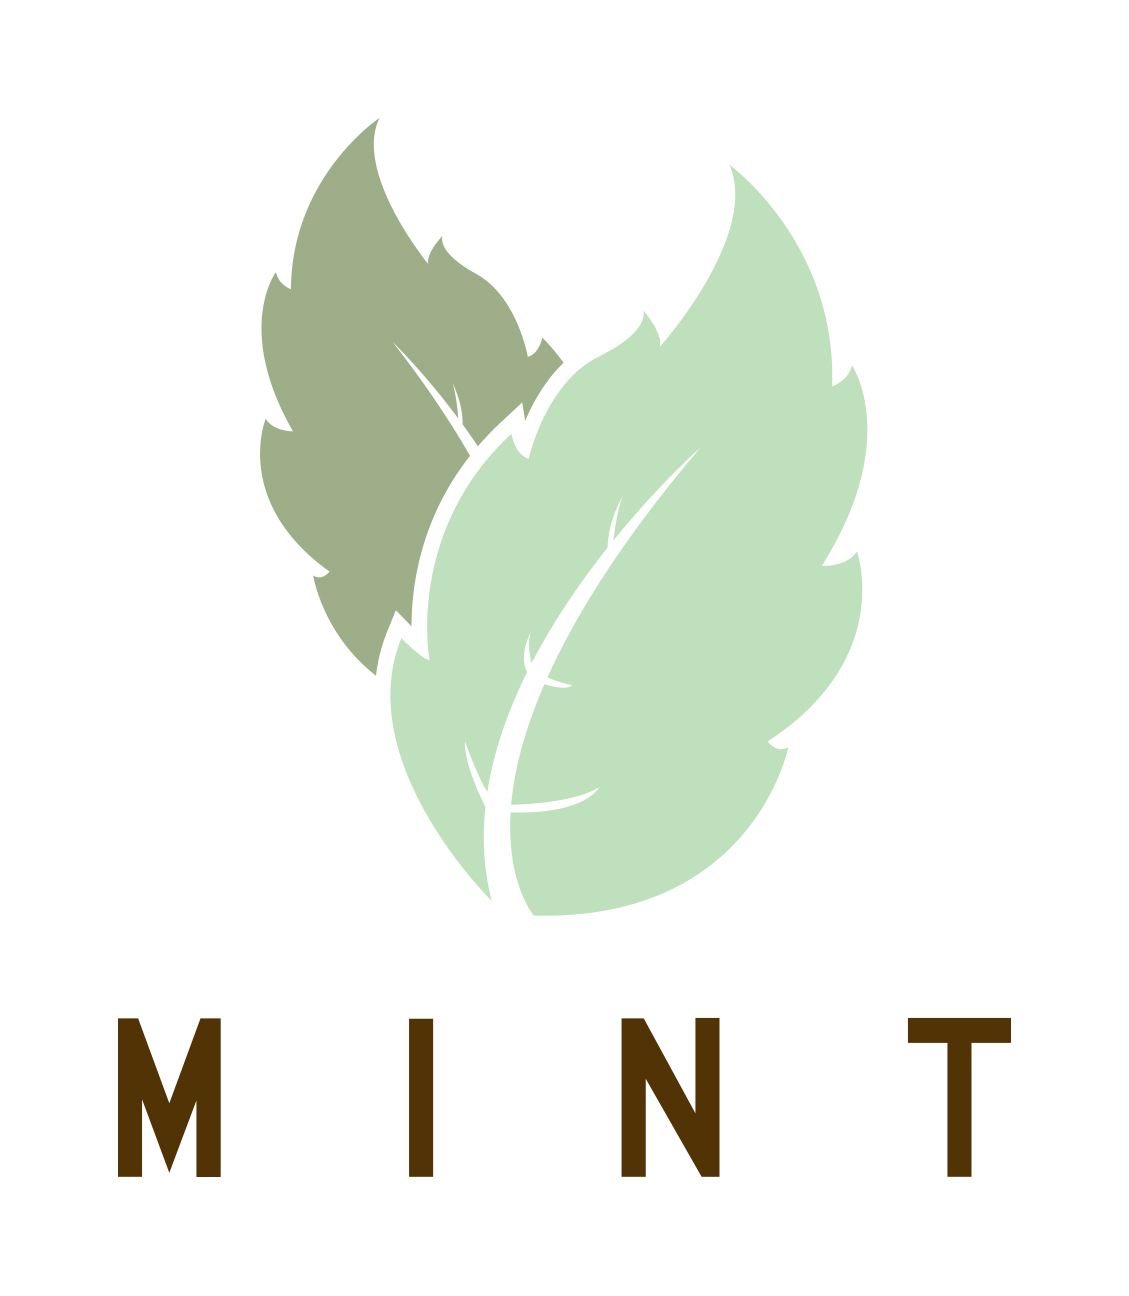 MINT - 01920 460 317